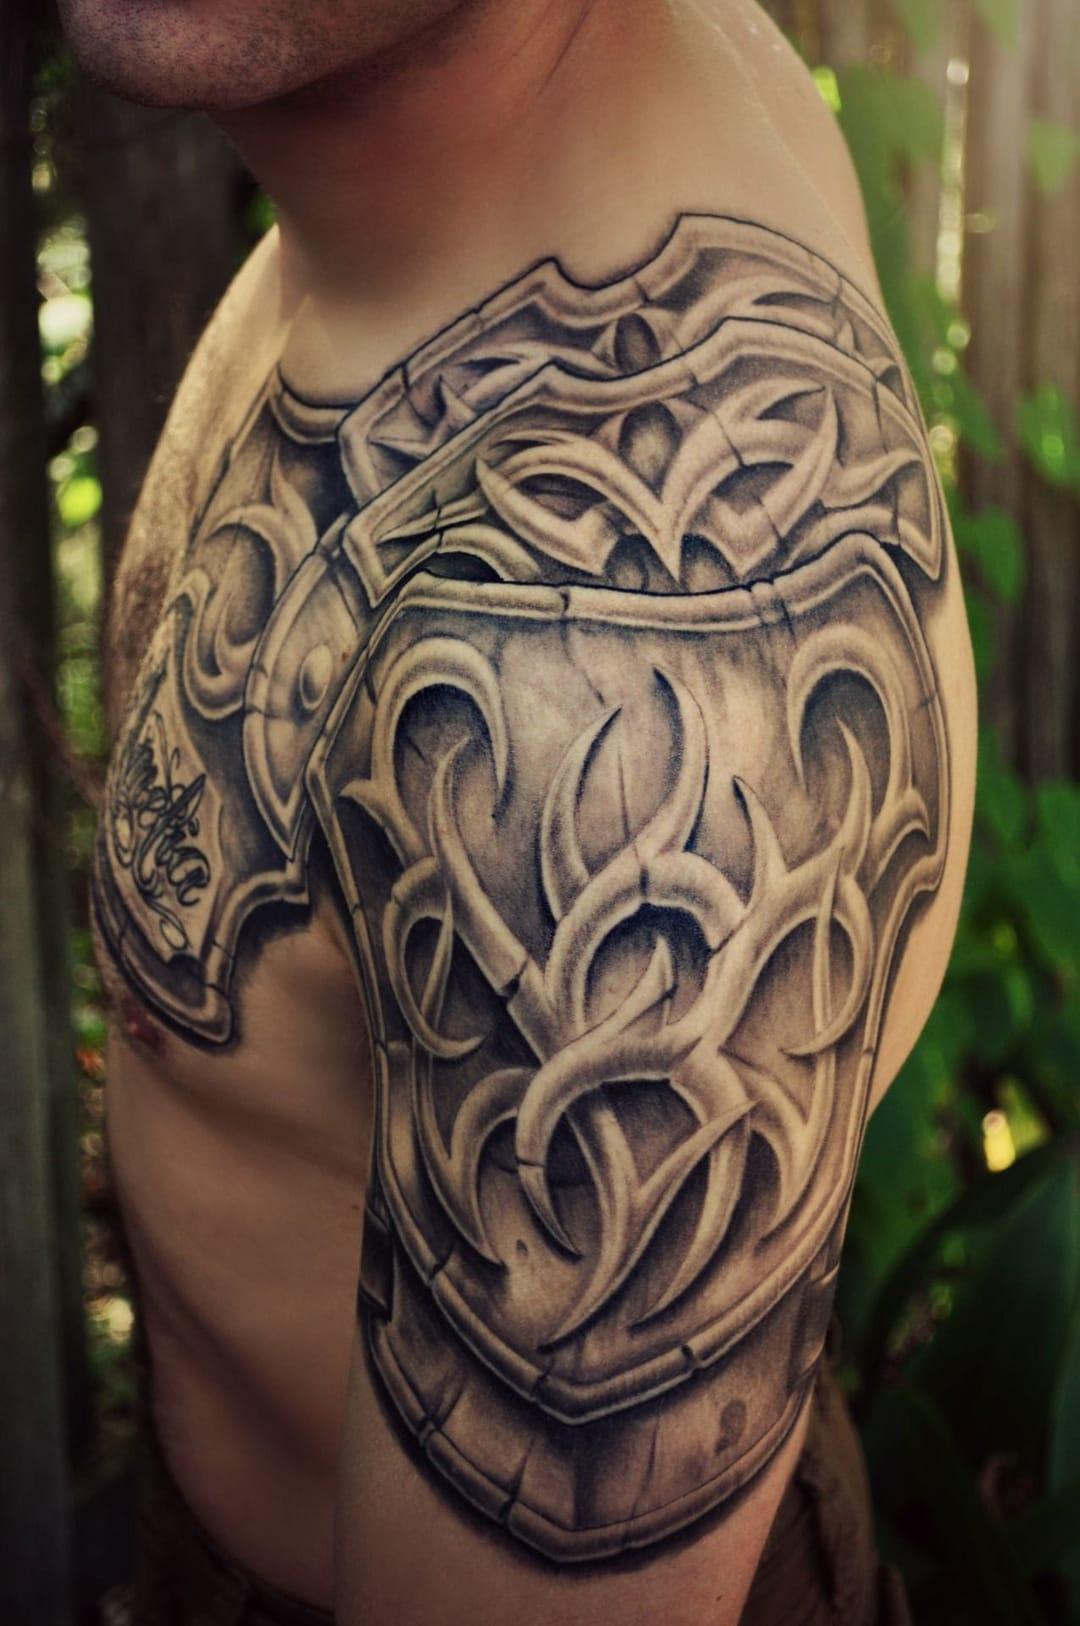 20 awesome epaulette tattoos